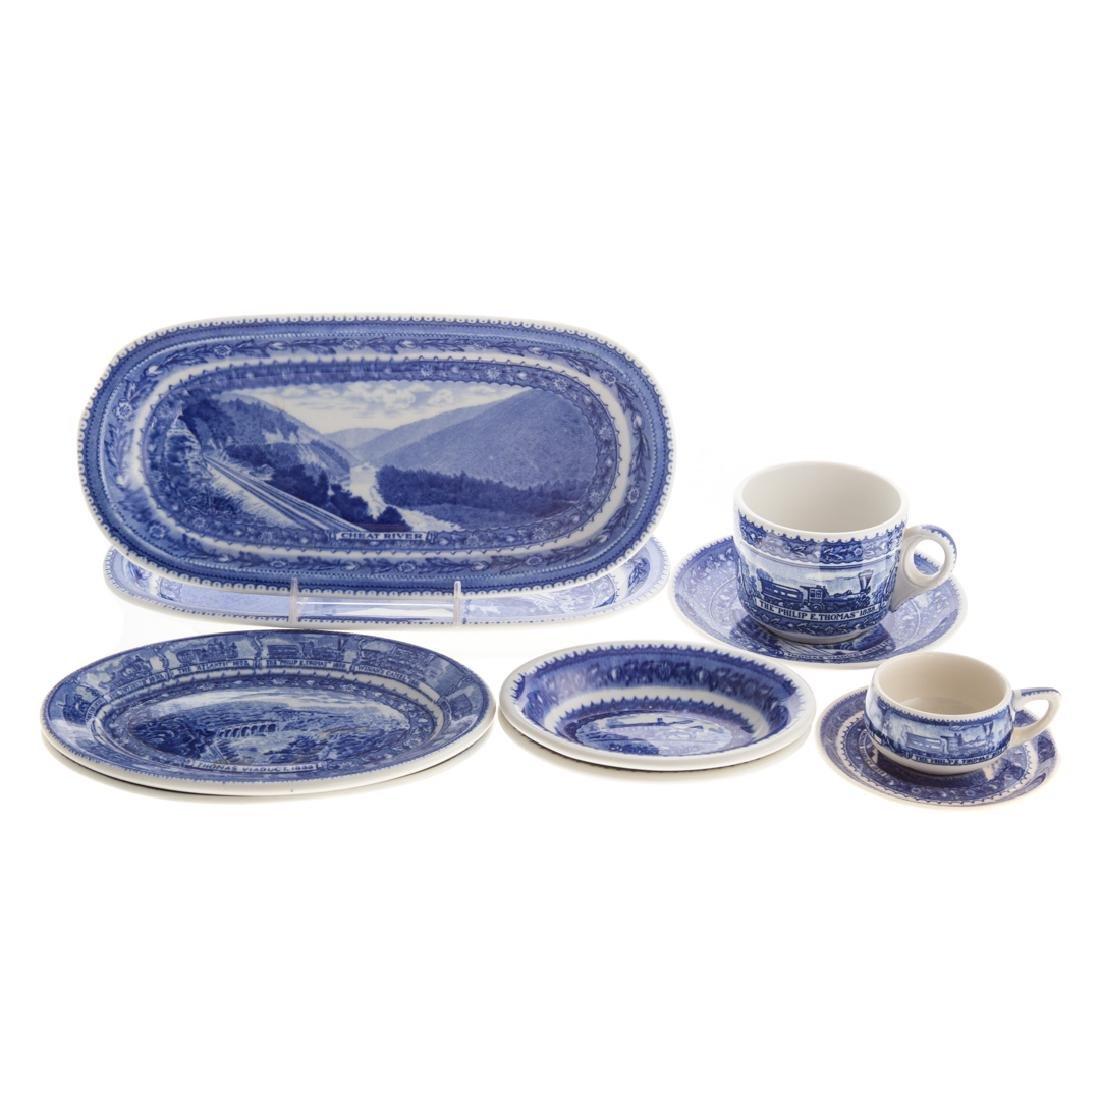 10 Lamberton B & O china serving pieces